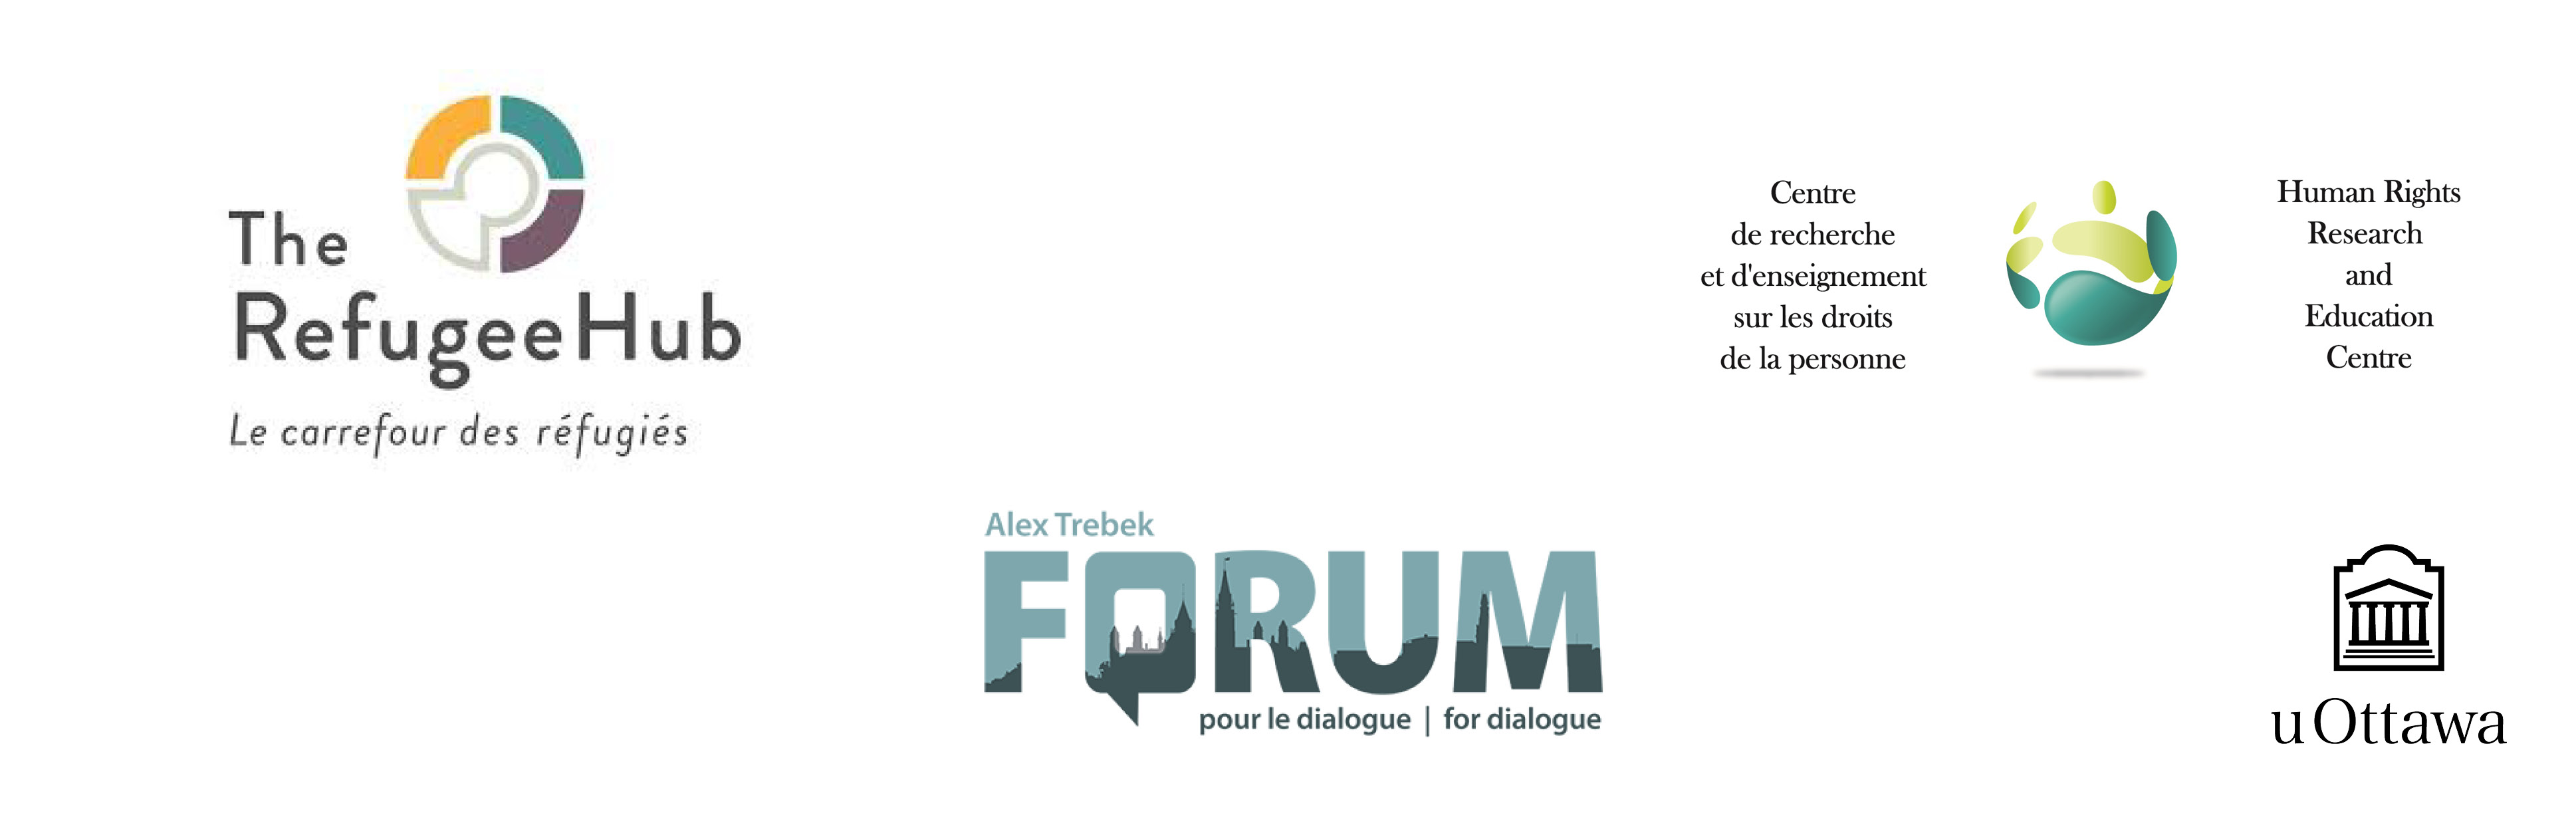 Partners - Alex-Trebek Postdoctoral Fellowship